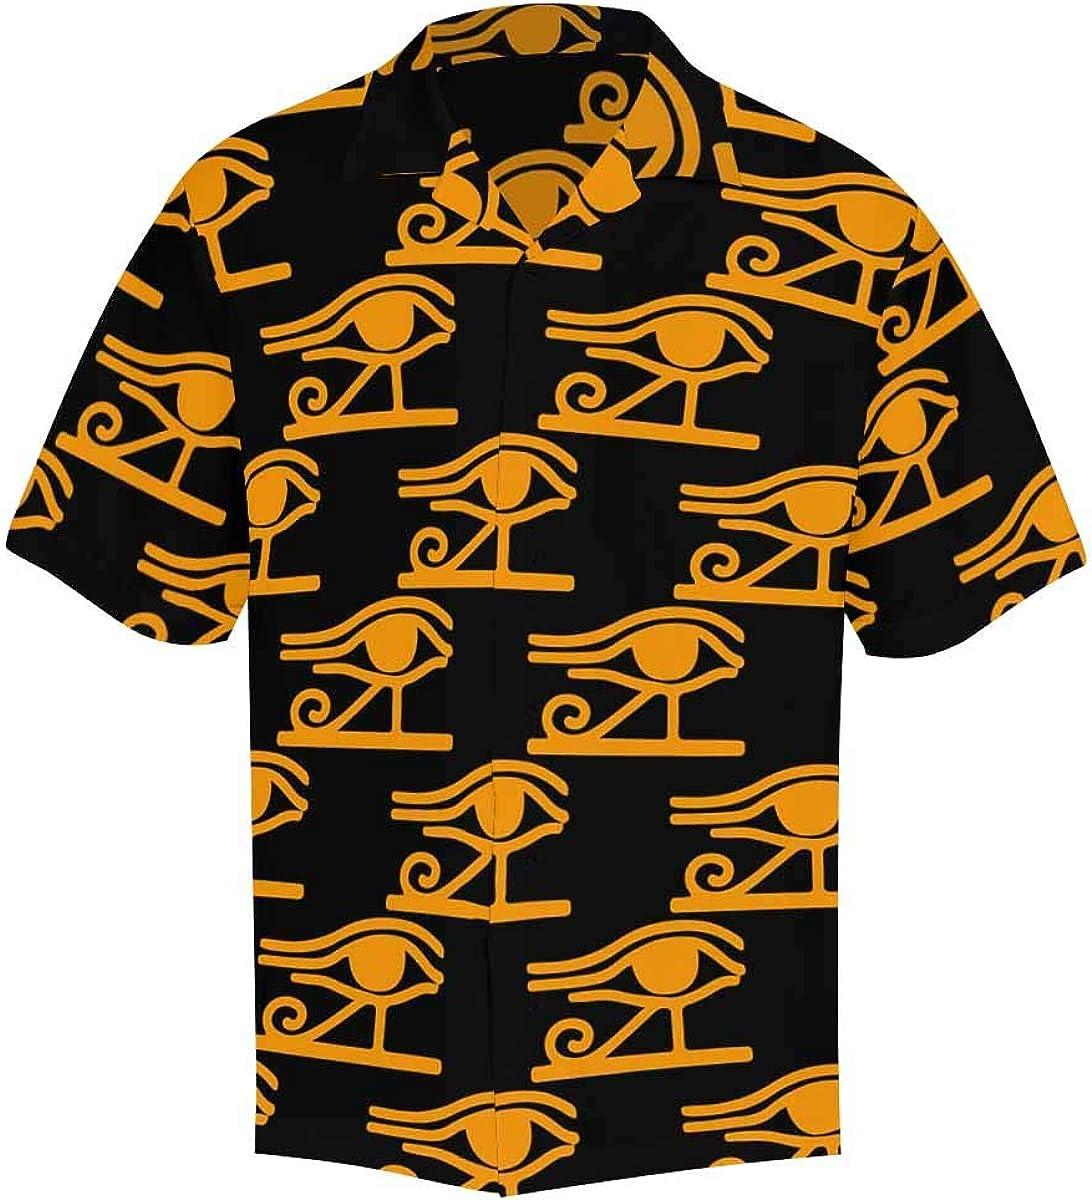 InterestPrint Men's Casual Button Down Short Sleeve Ethnic Tribal Paisley Hawaiian Shirt (S-5XL)